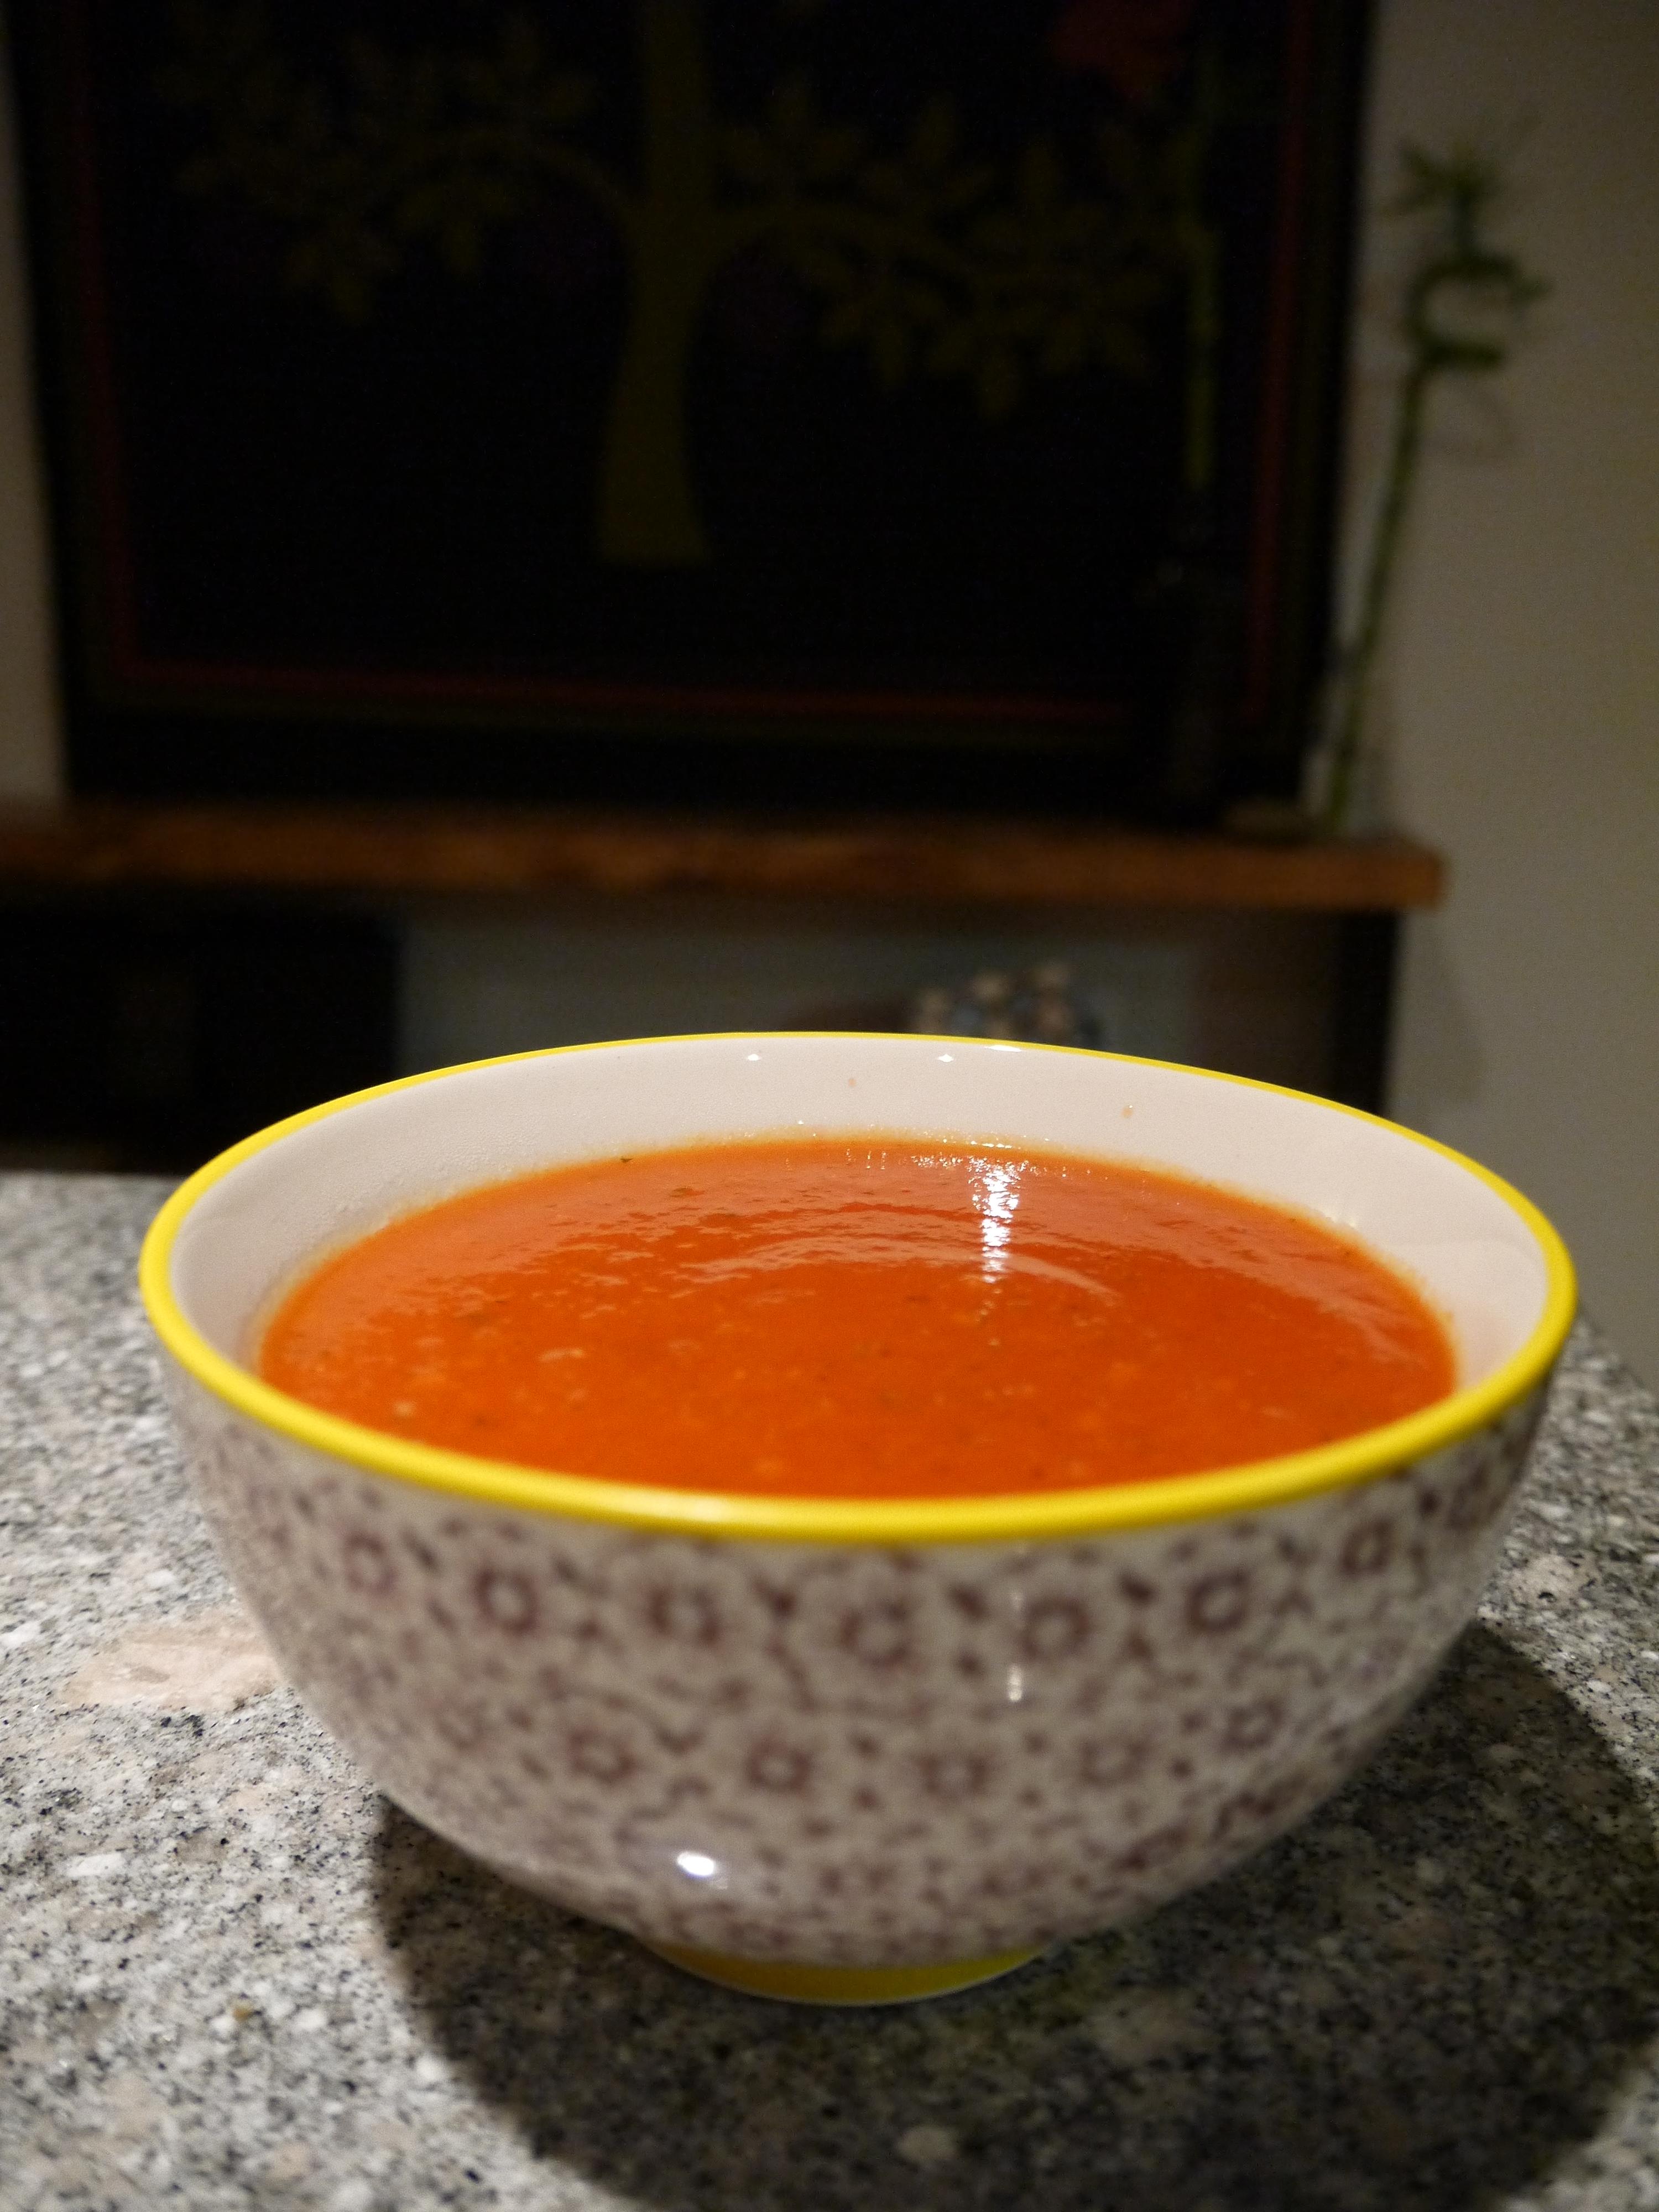 tomato soup - trust in kim